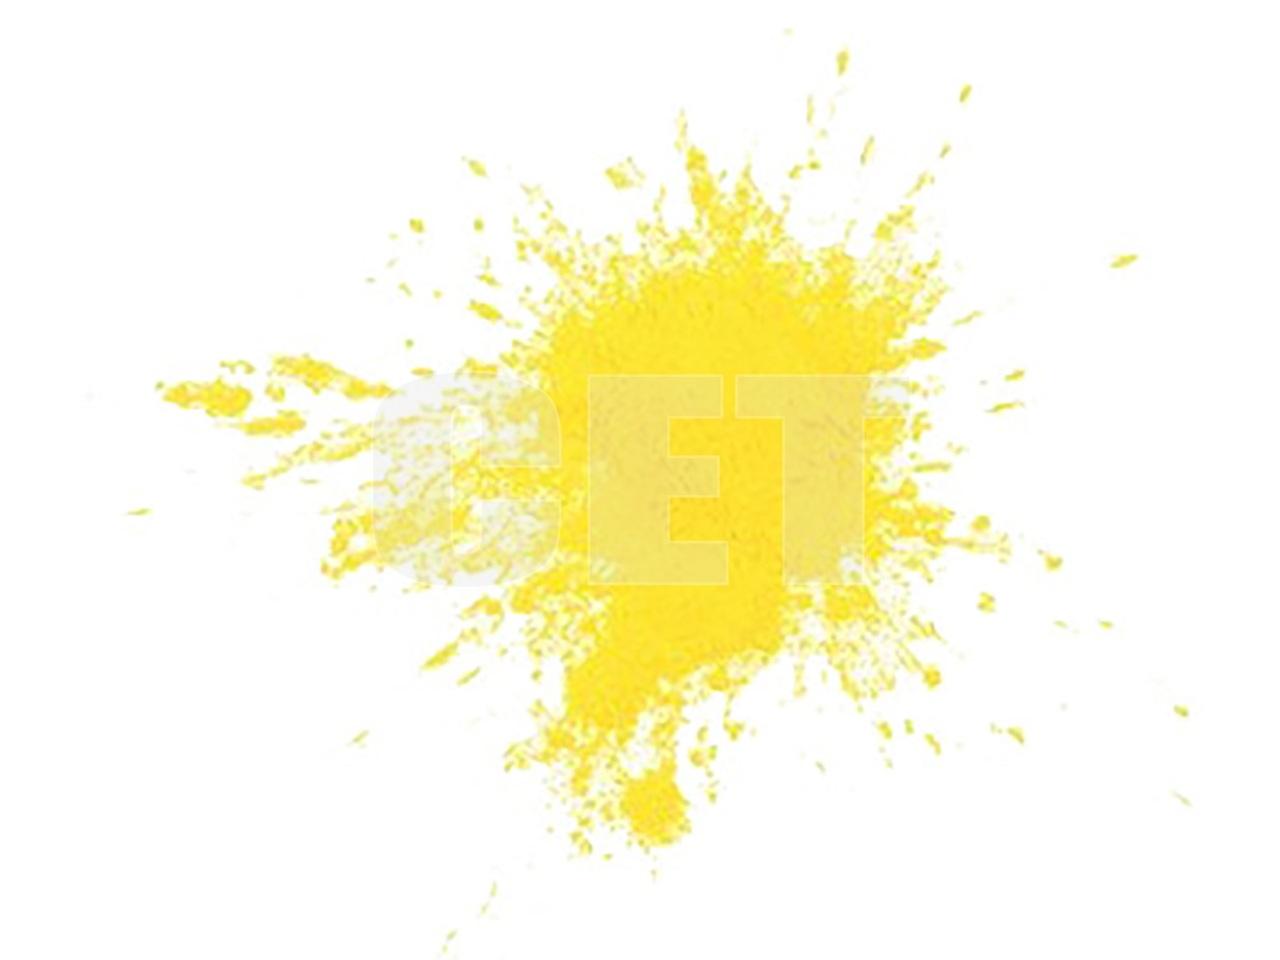 Тонер PK206 для KYOCERA ECOSYSM6030cdn/6035cidn/6530cdn/P6035cdn (Japan) Yellow,10кг/мешок, (унив.), OSP0206Y